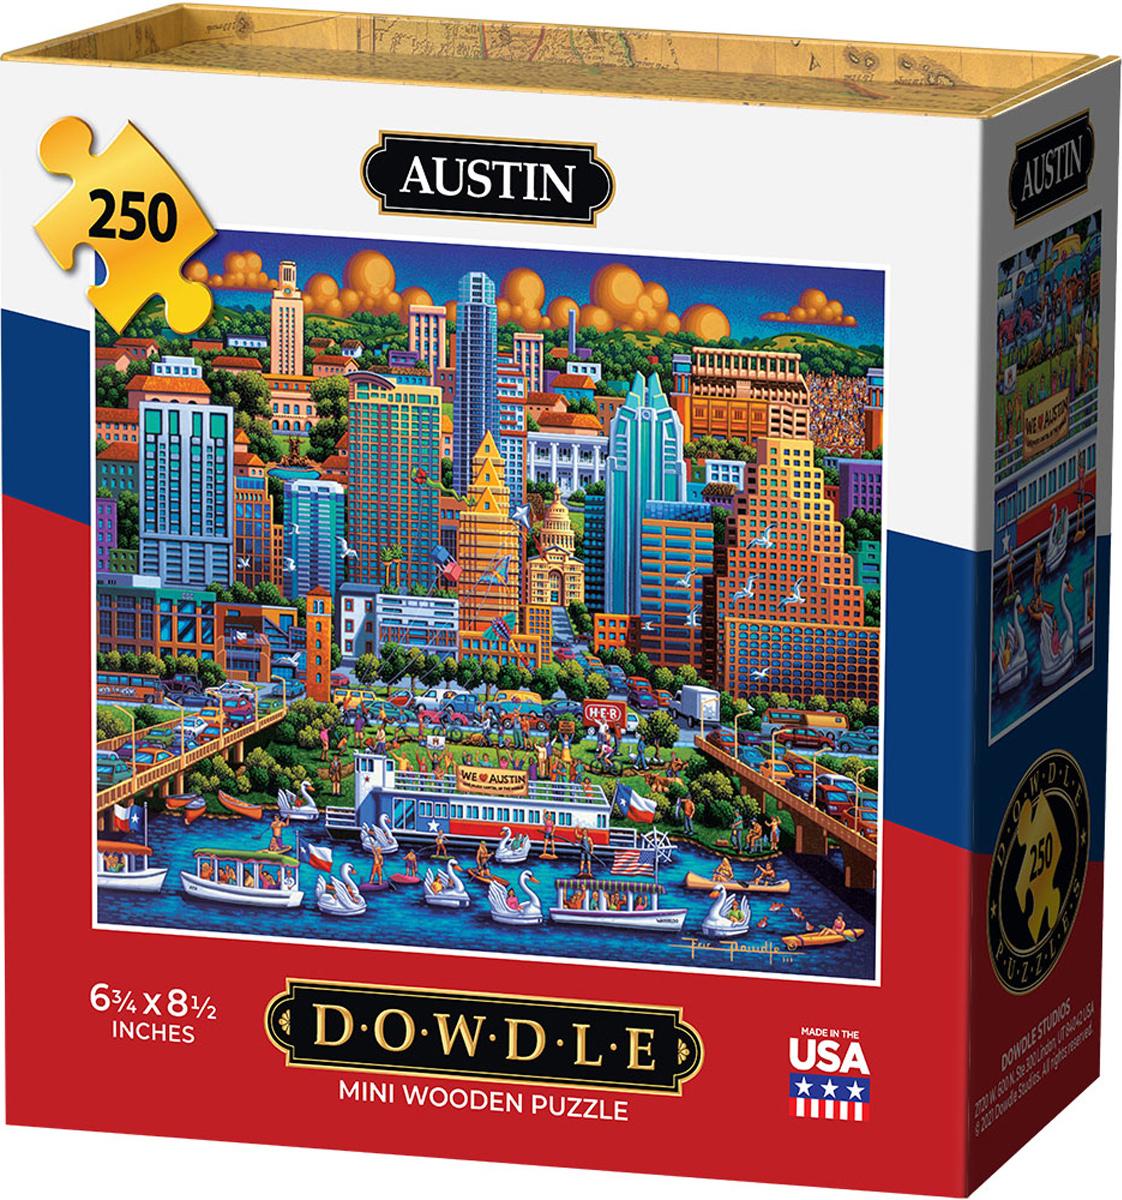 Austin Cities Jigsaw Puzzle